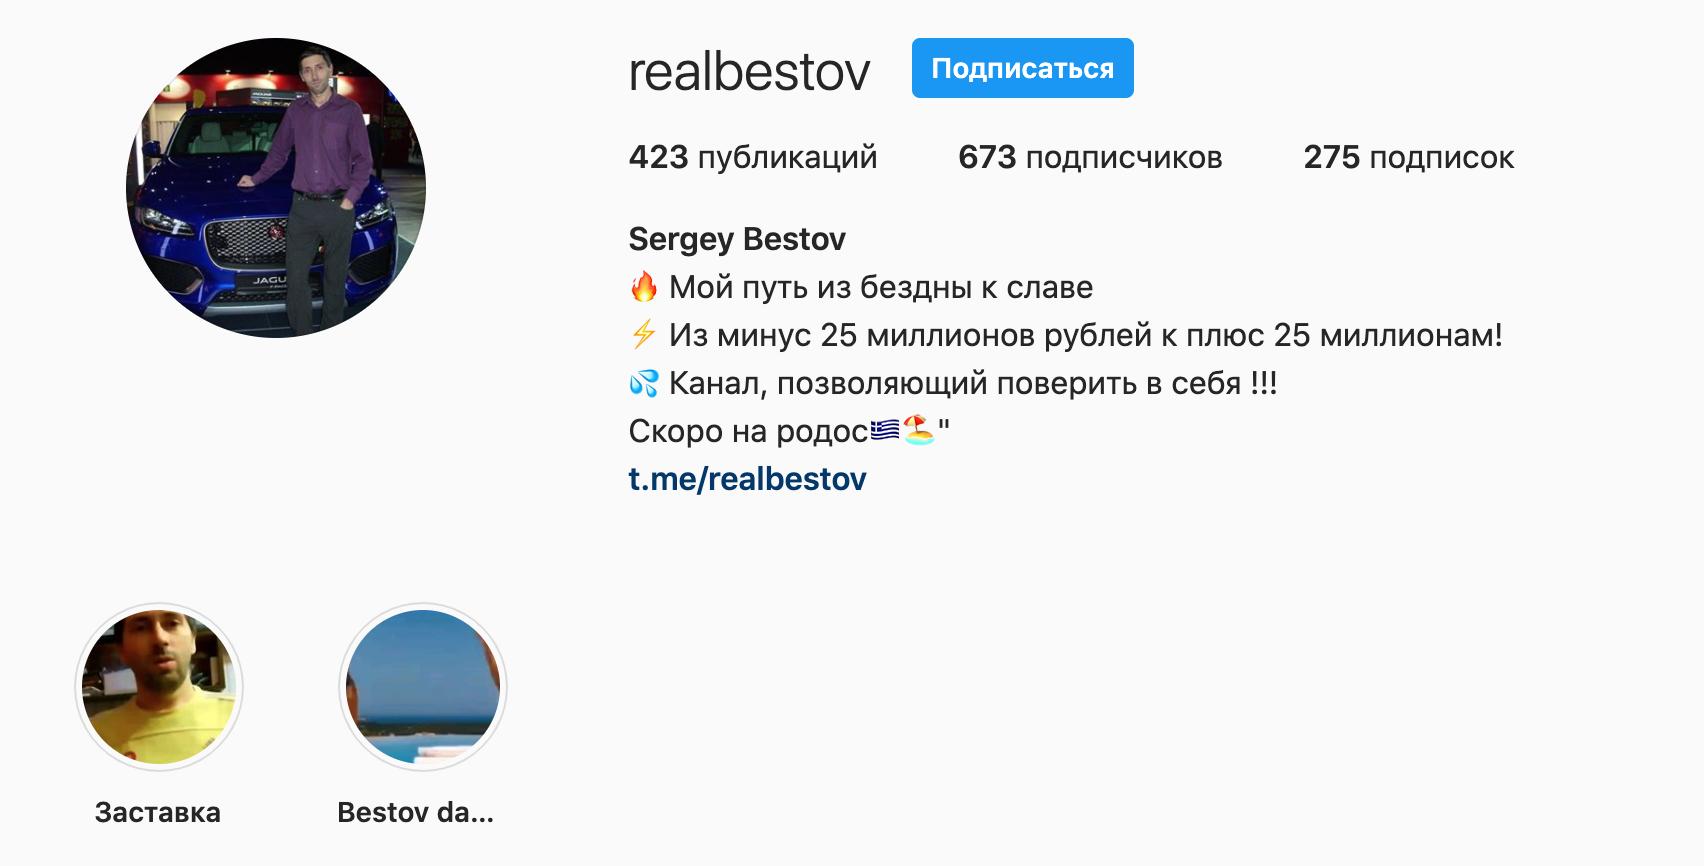 Инстаграм Сергея Бестова